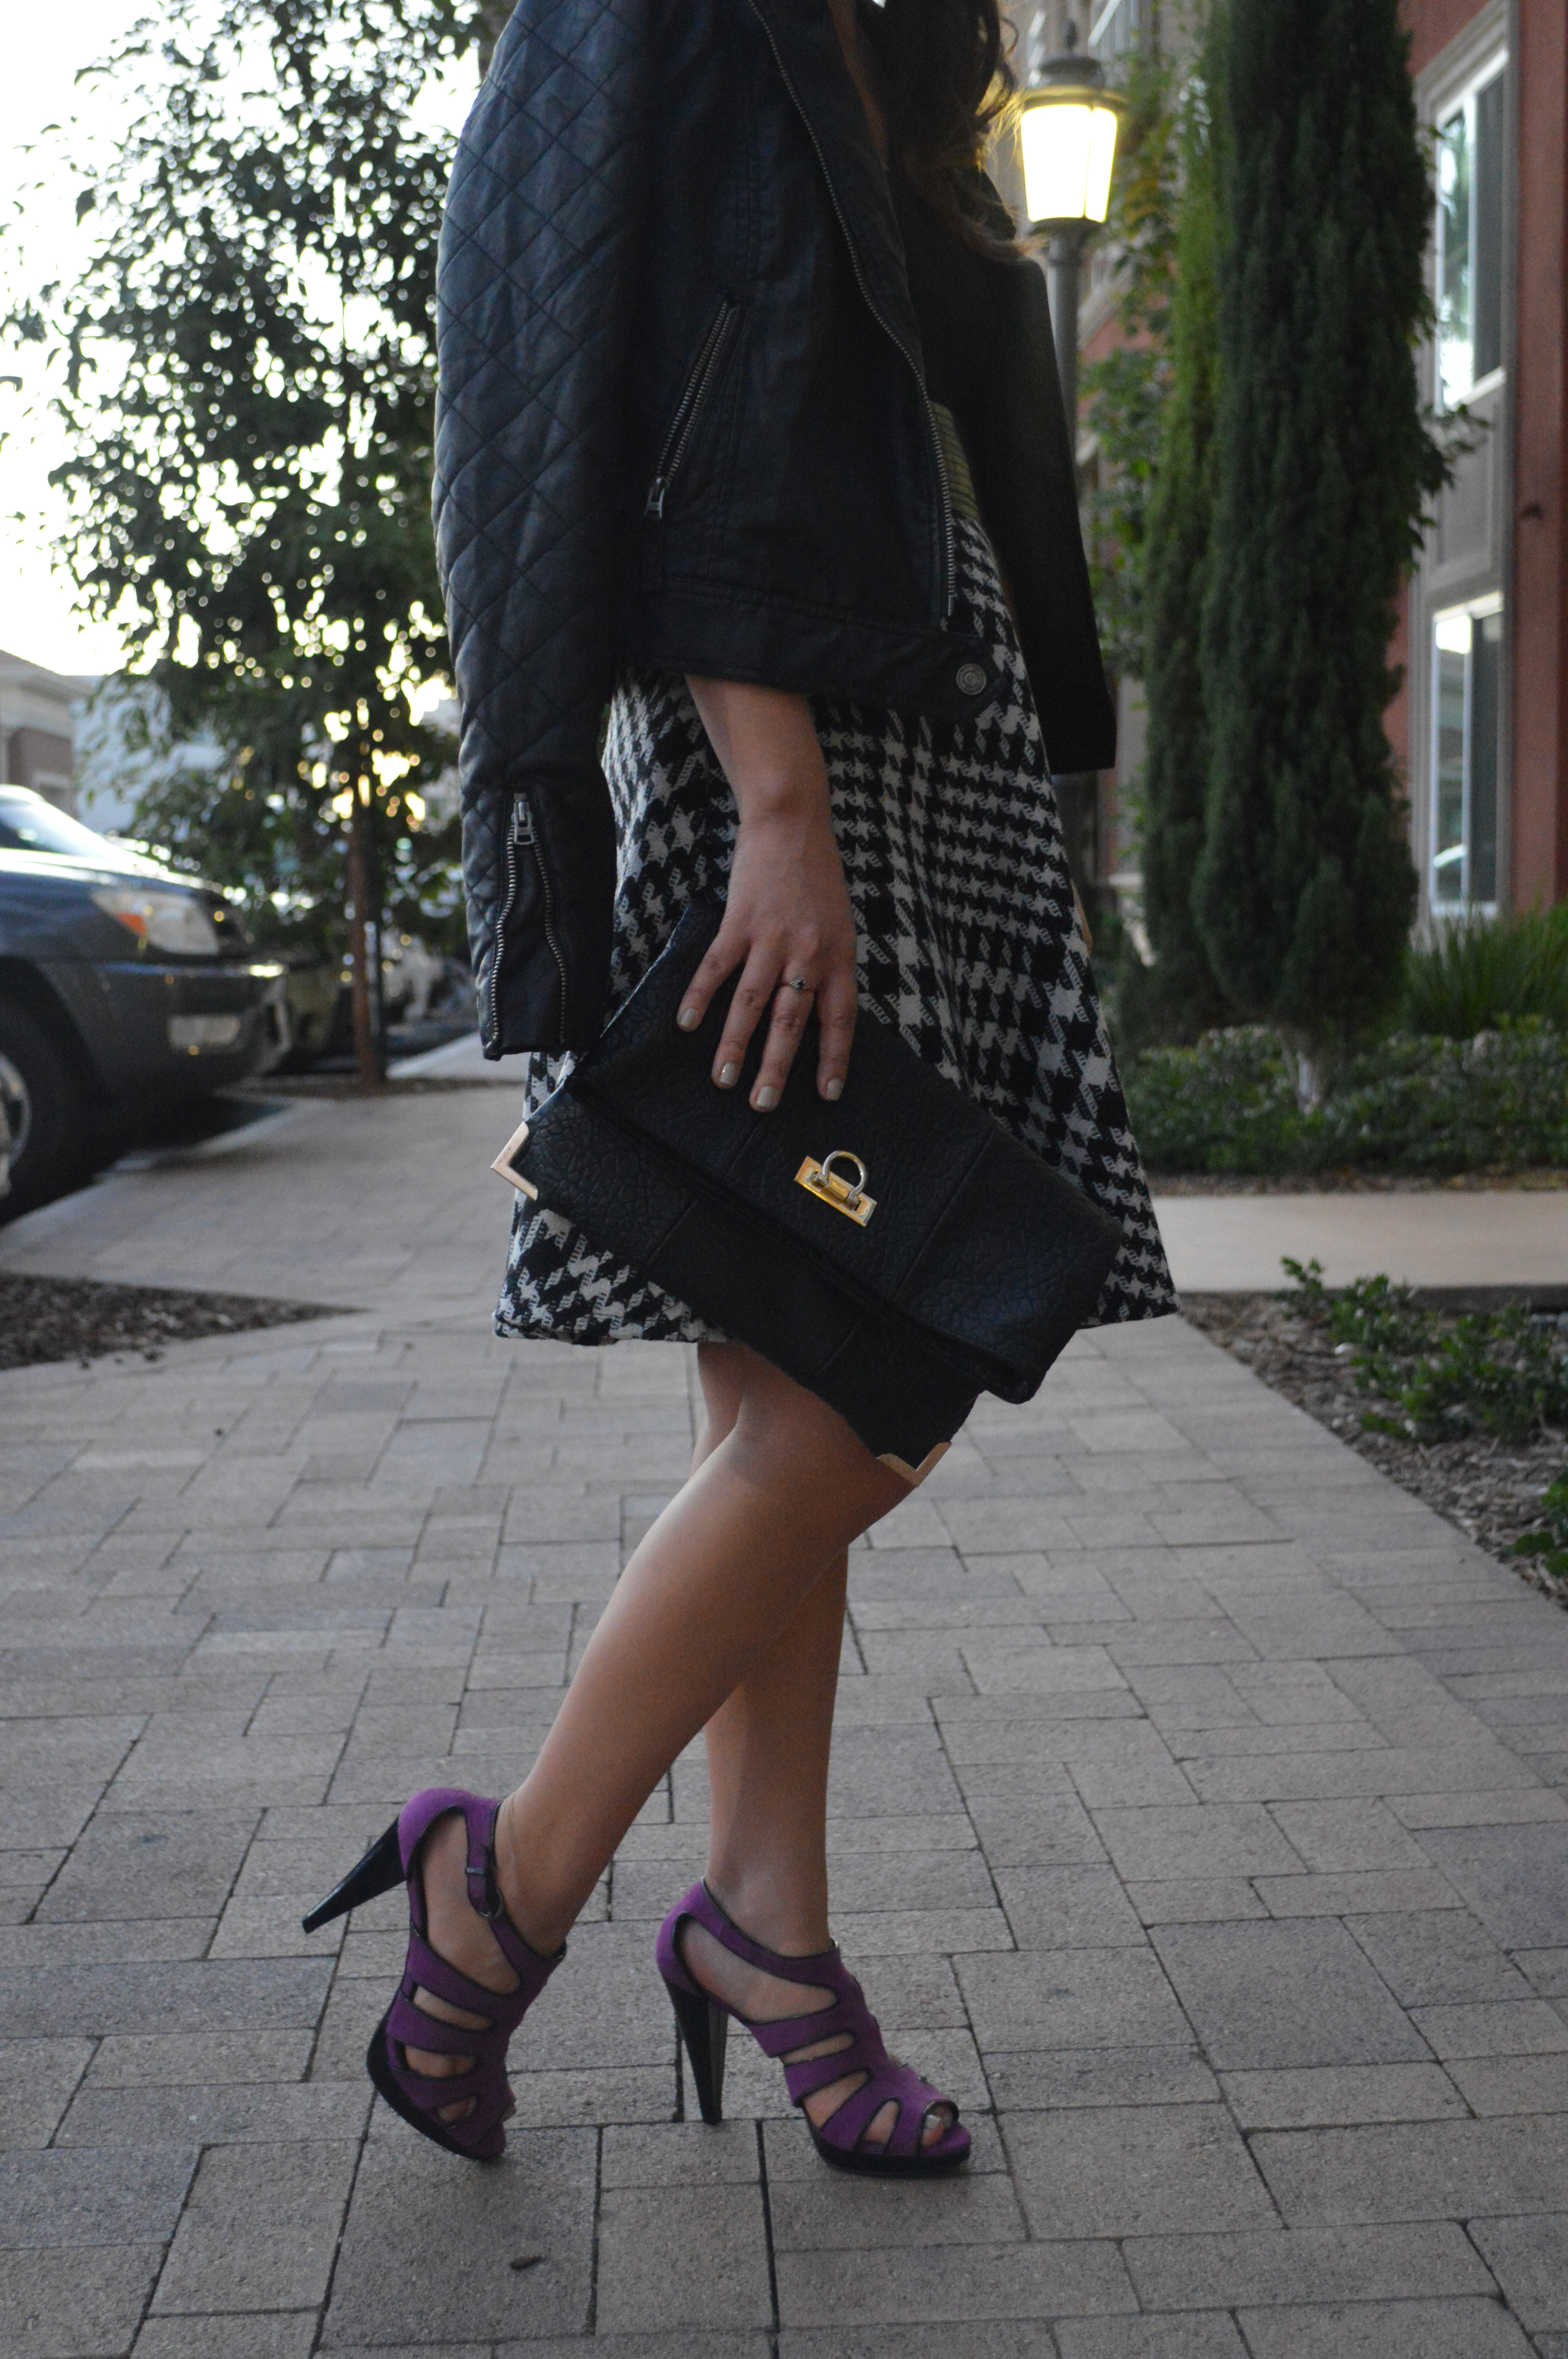 eShakti customized houndstooth skirt on Ciera Chang from WorldWideStylista